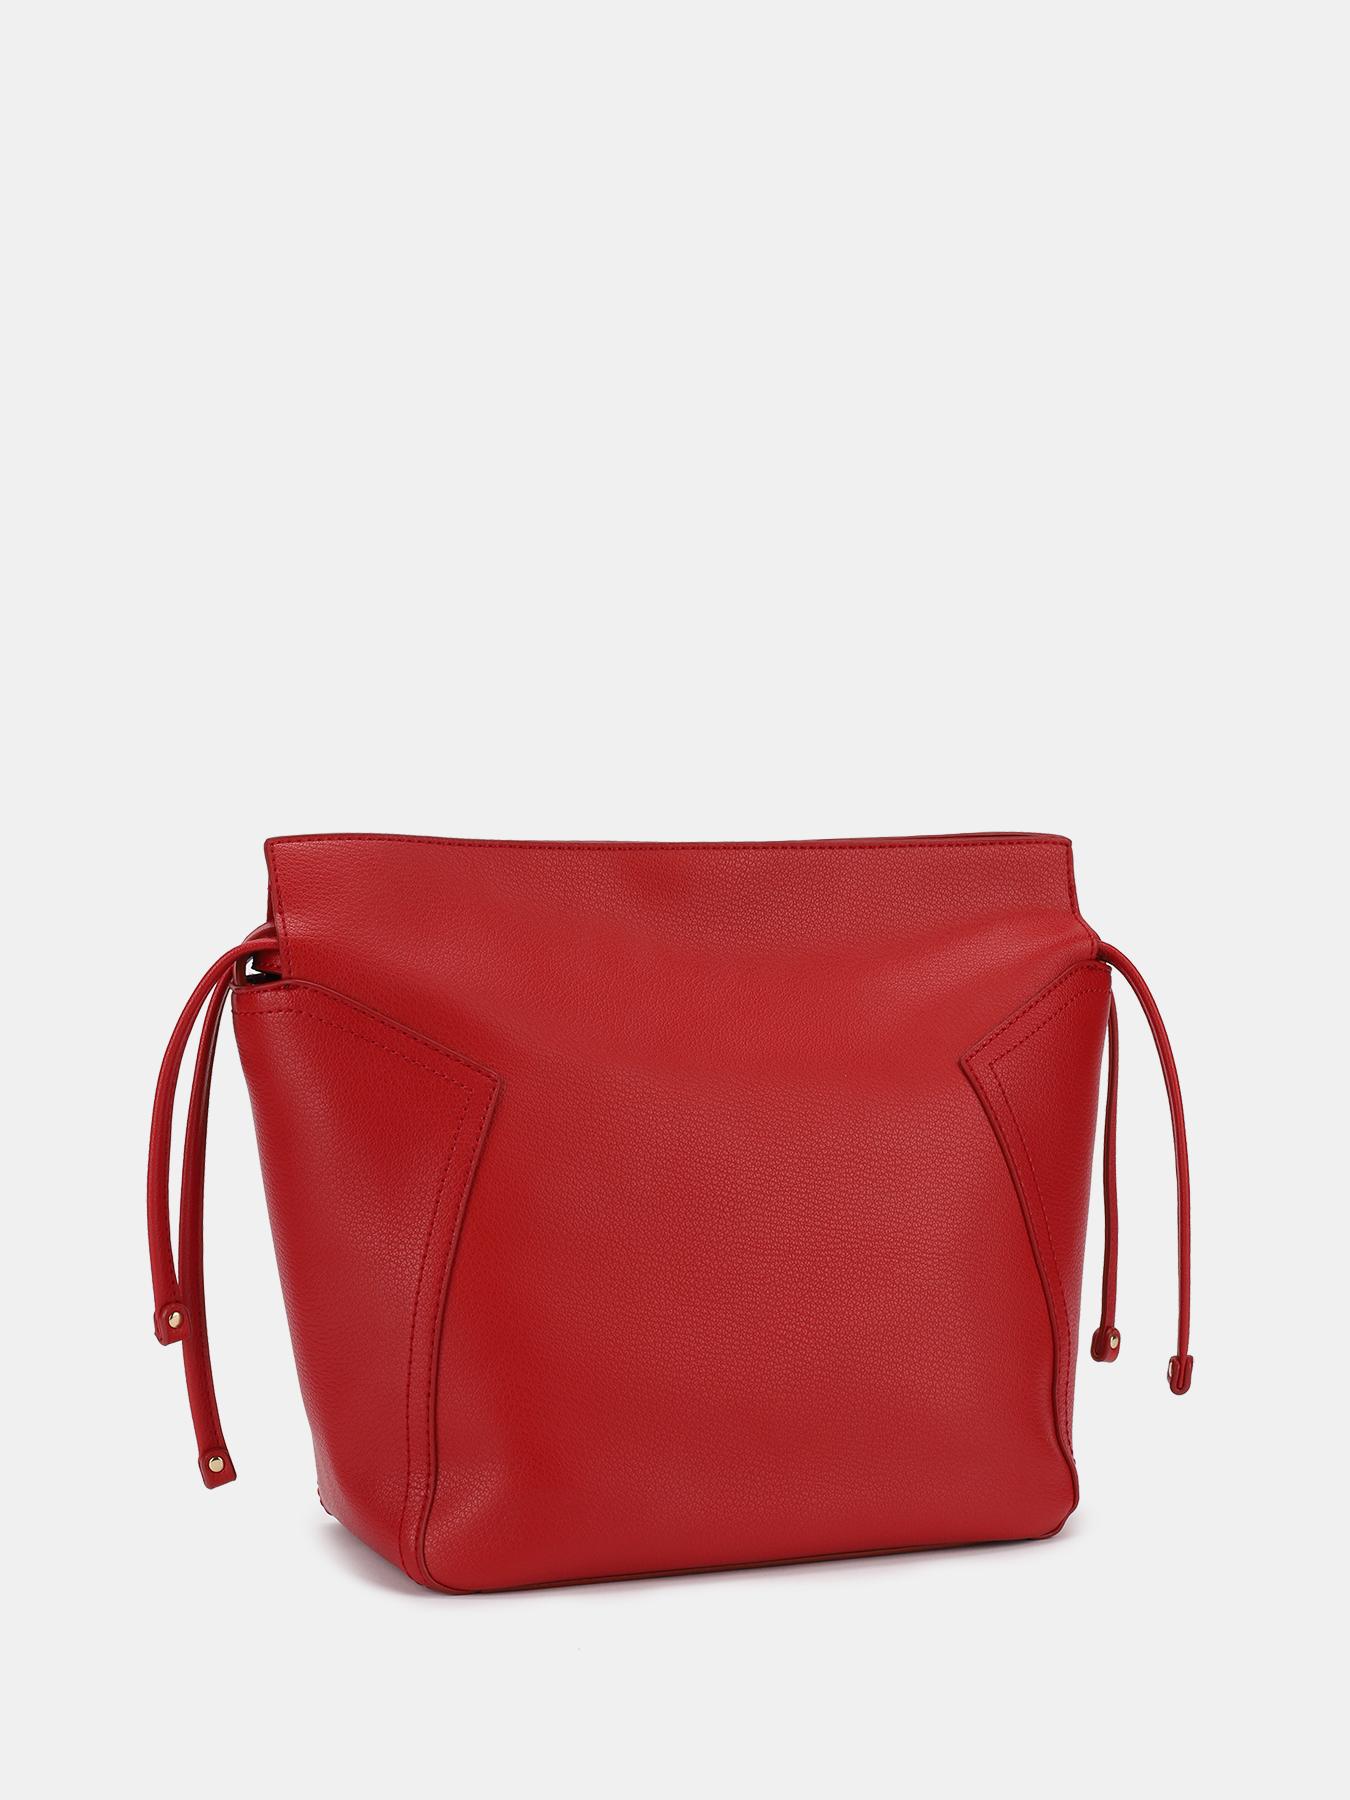 Liu Jo Женская сумка 338725-185 Фото 2